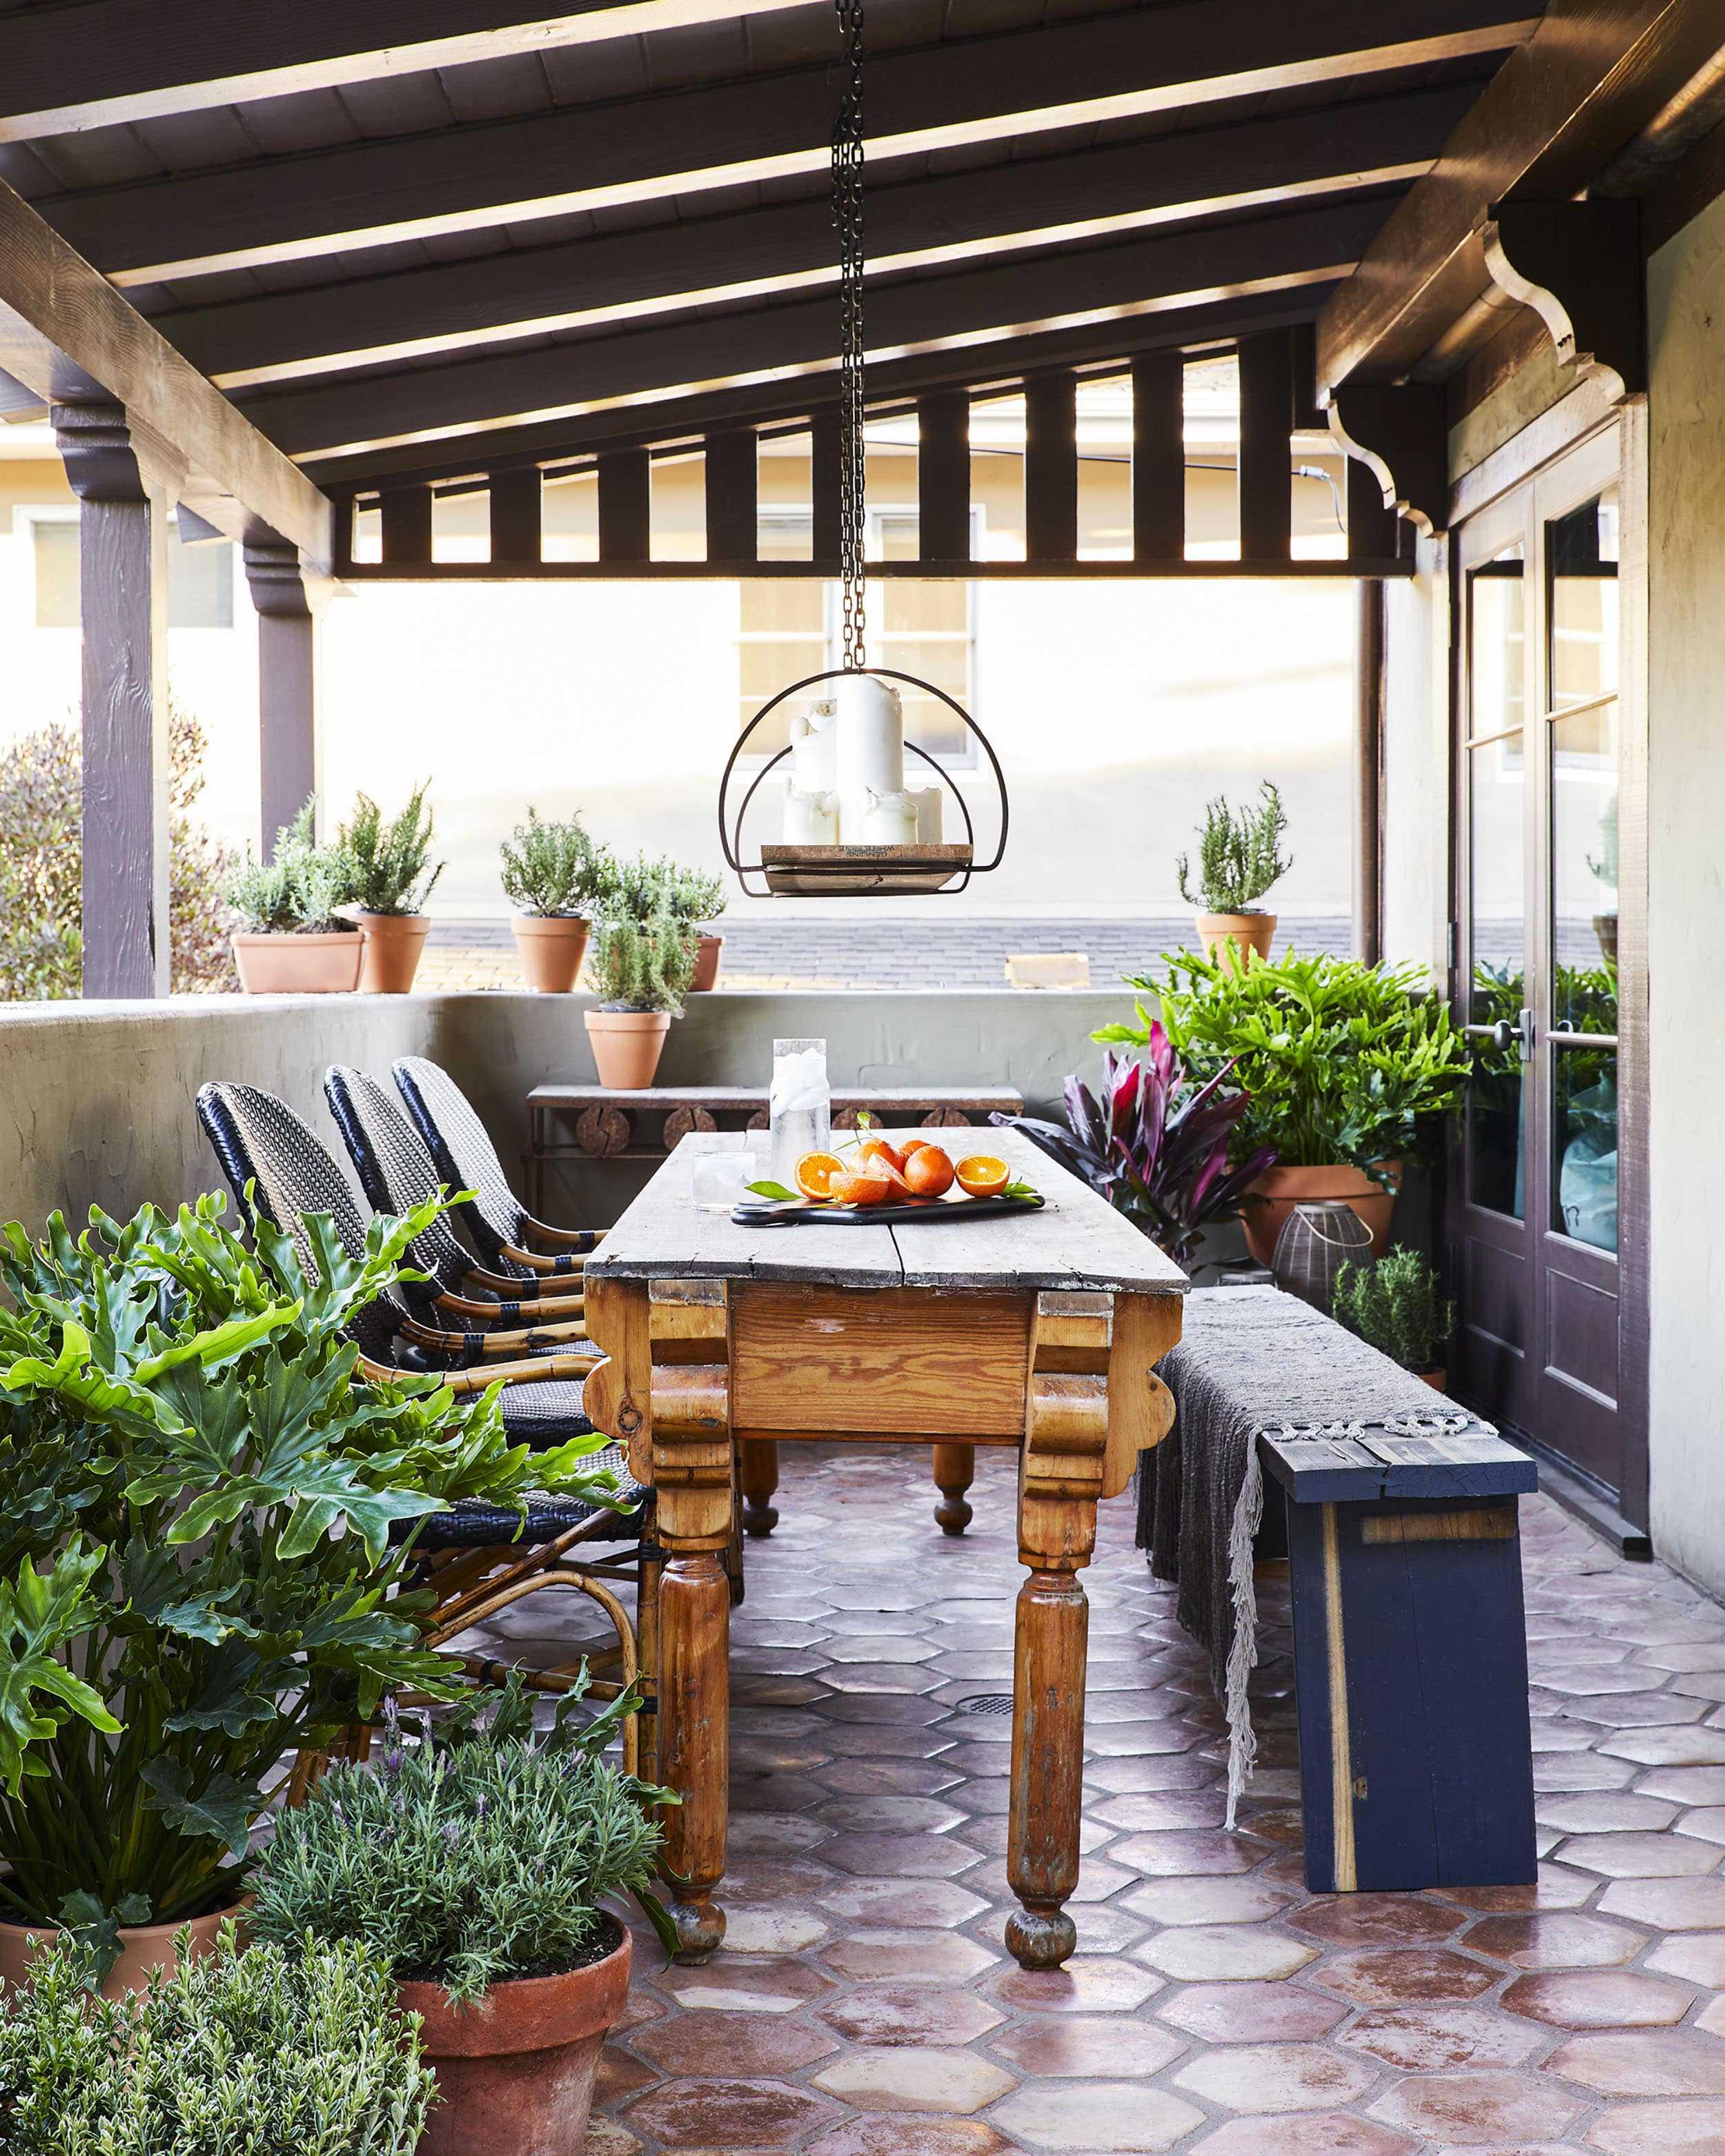 Emily Henderson backyard ideas 9